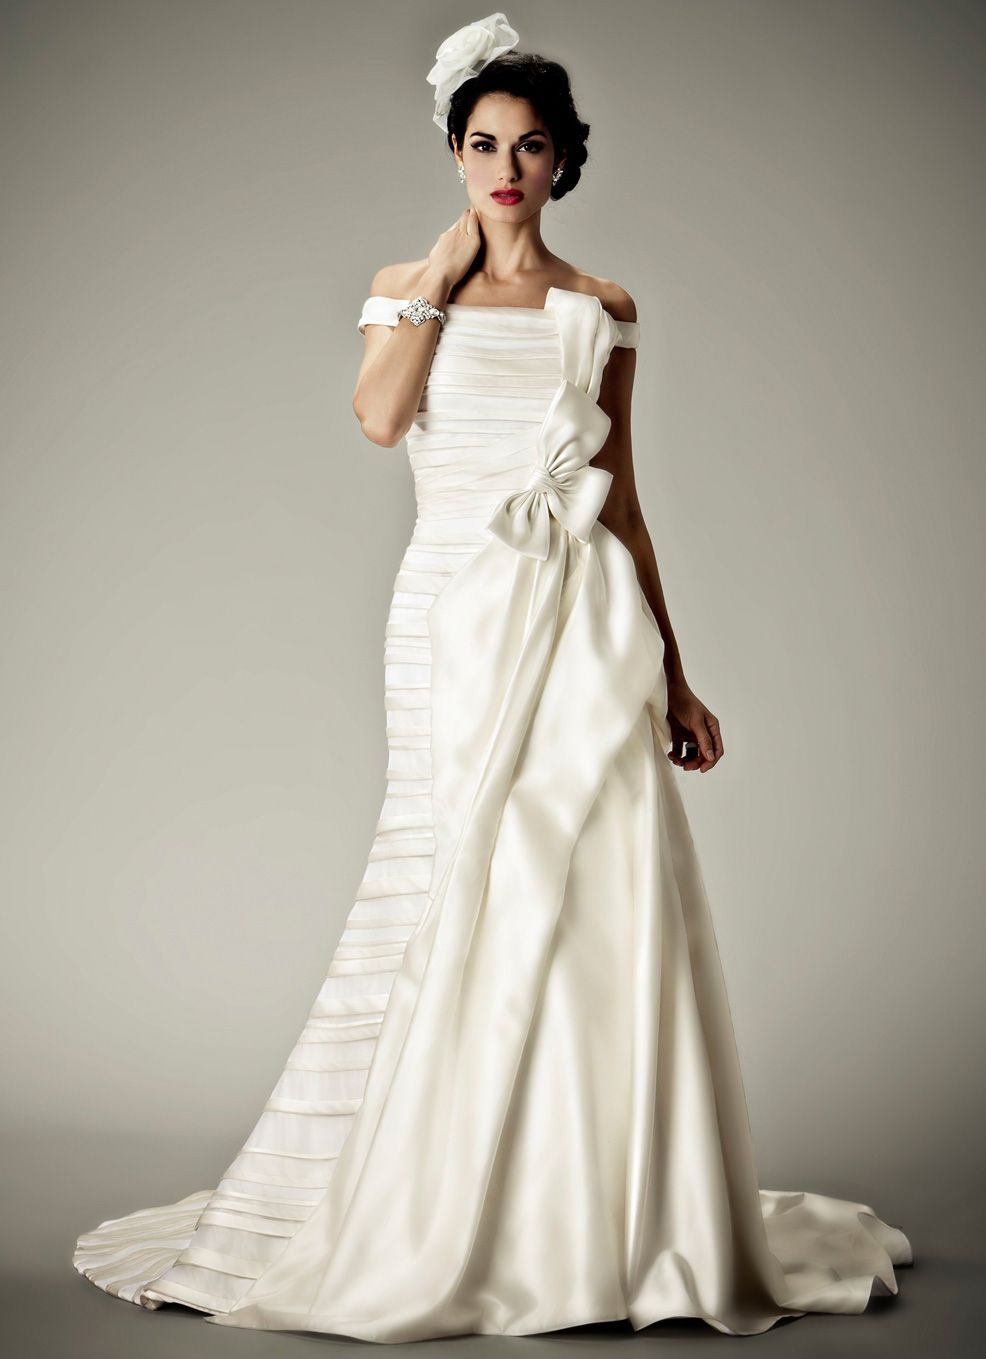 Matthew christoper ubandeauu vintage inspired wedding dress